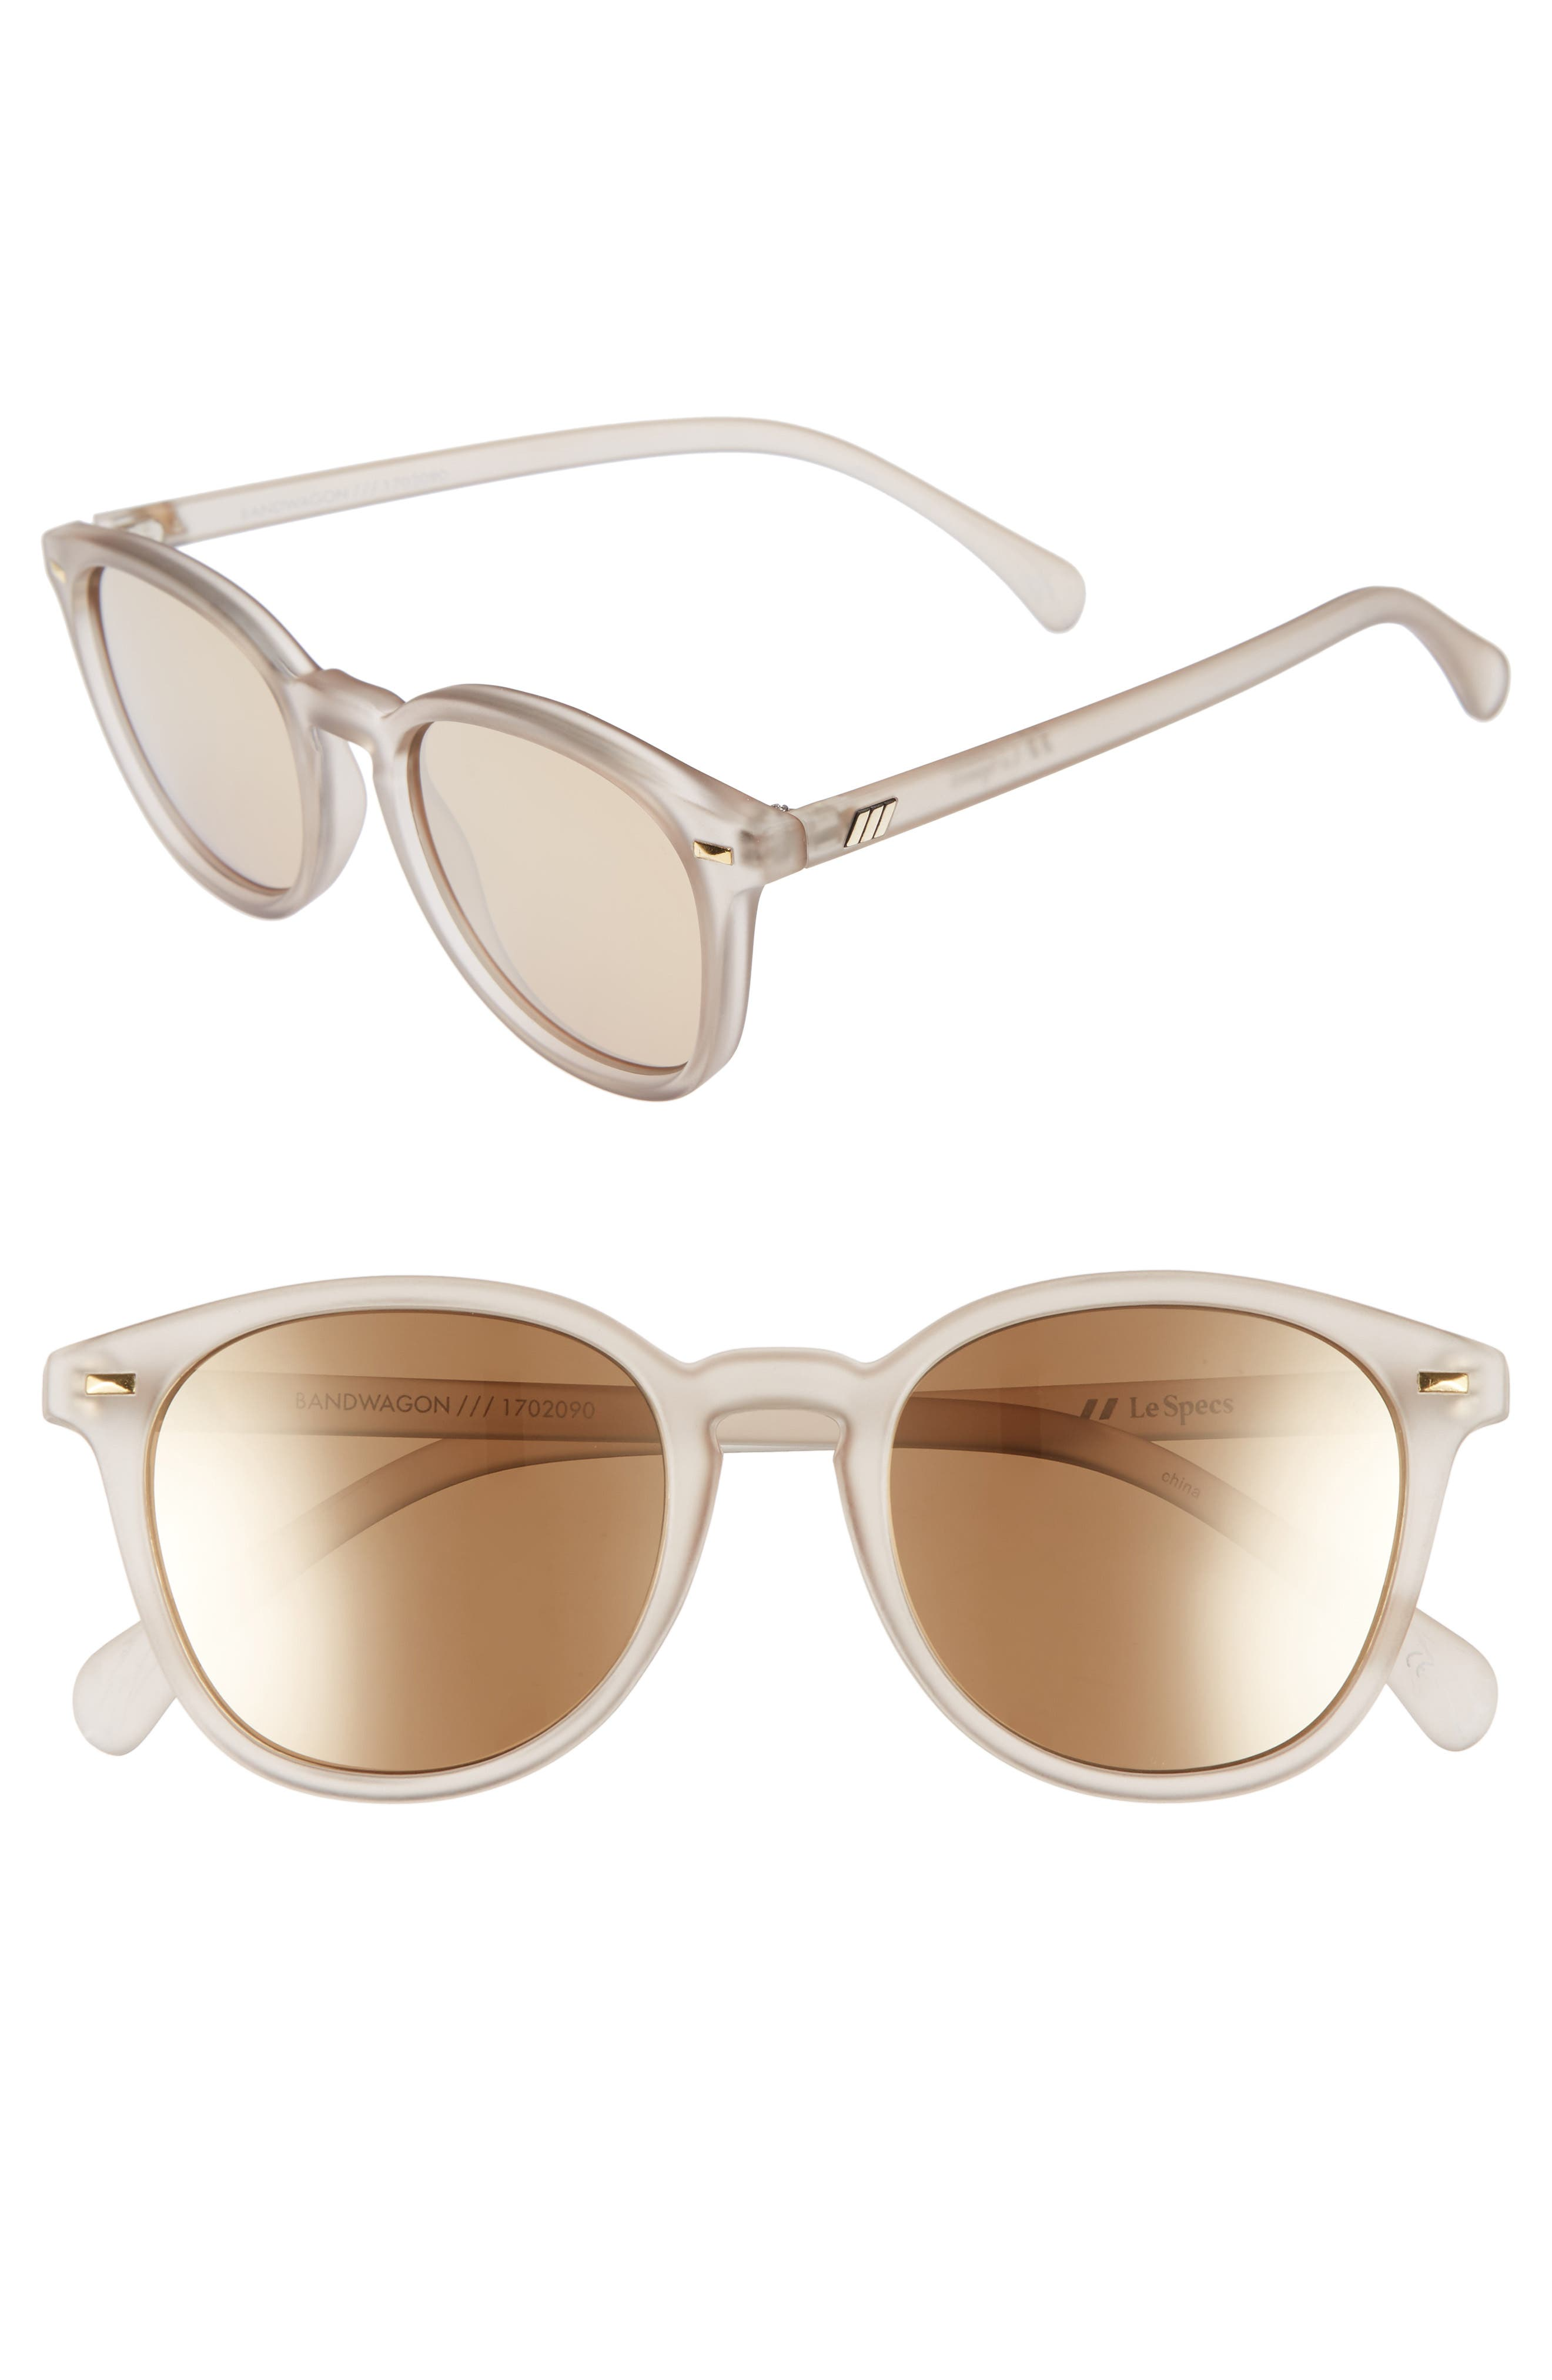 Alternate Image 1 Selected - Le Specs 'Bandwagon' 51mm Sunglasses